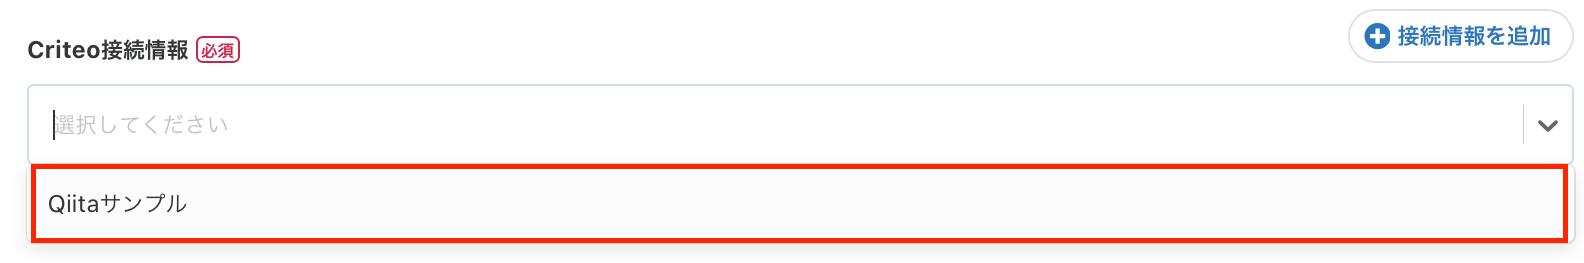 接続情報追加.png